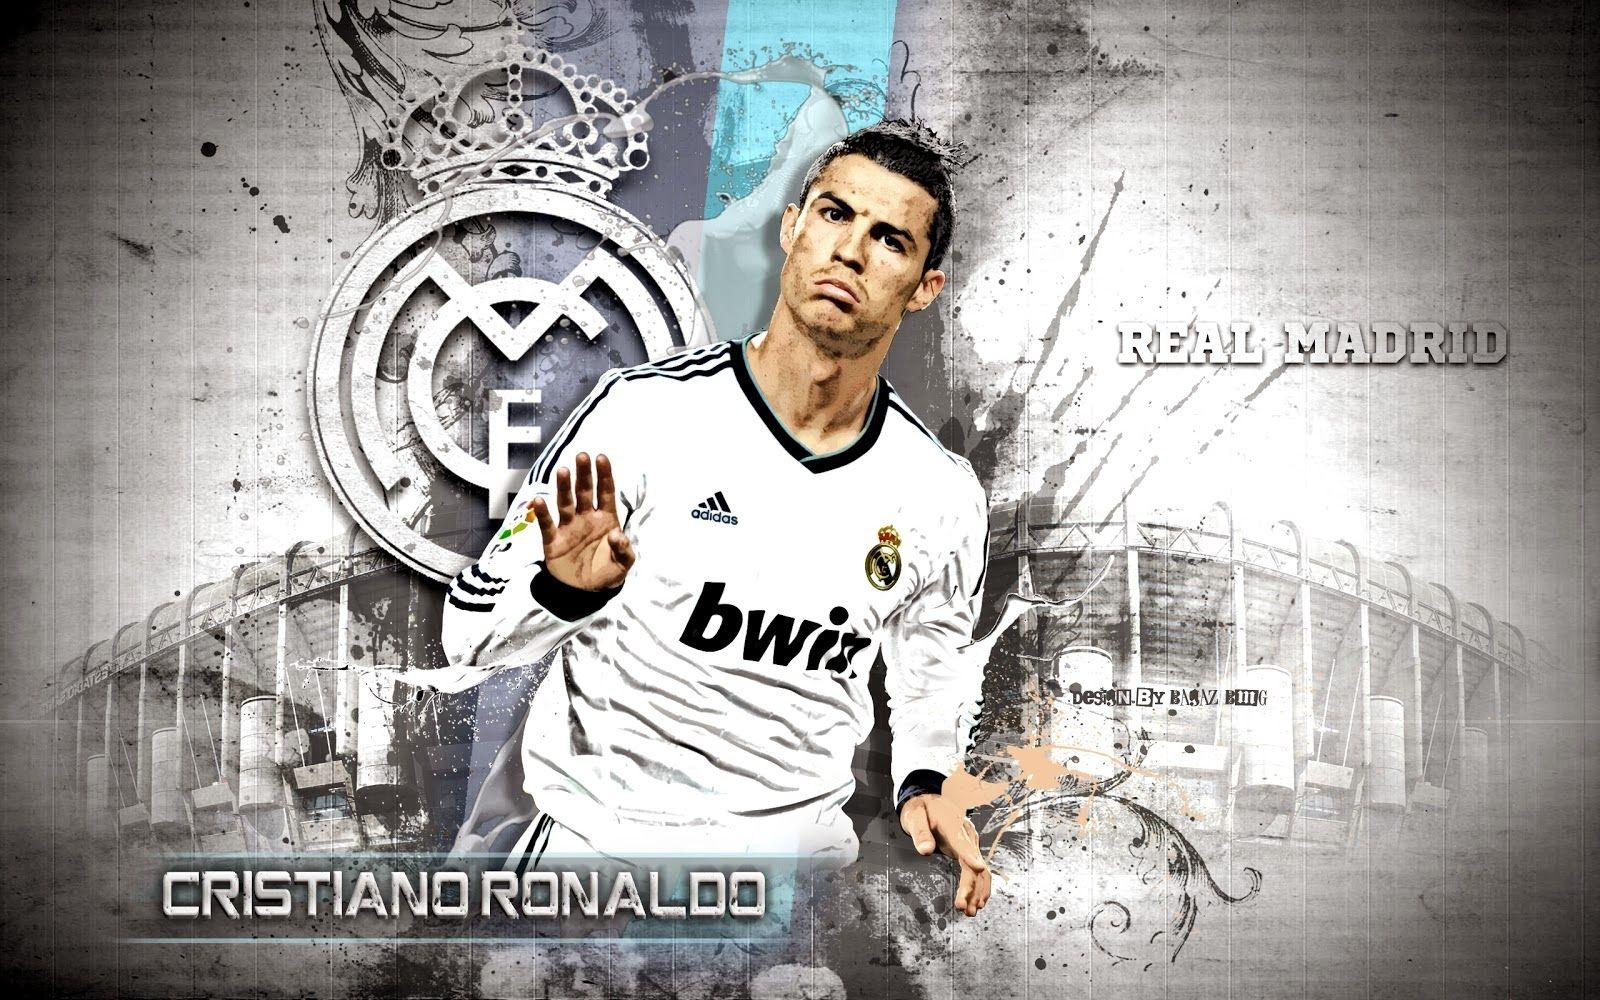 Hd wallpaper ronaldo - Cristiano Ronaldo Hd Wallpaper Images Pics Hd Wallpapers Blog